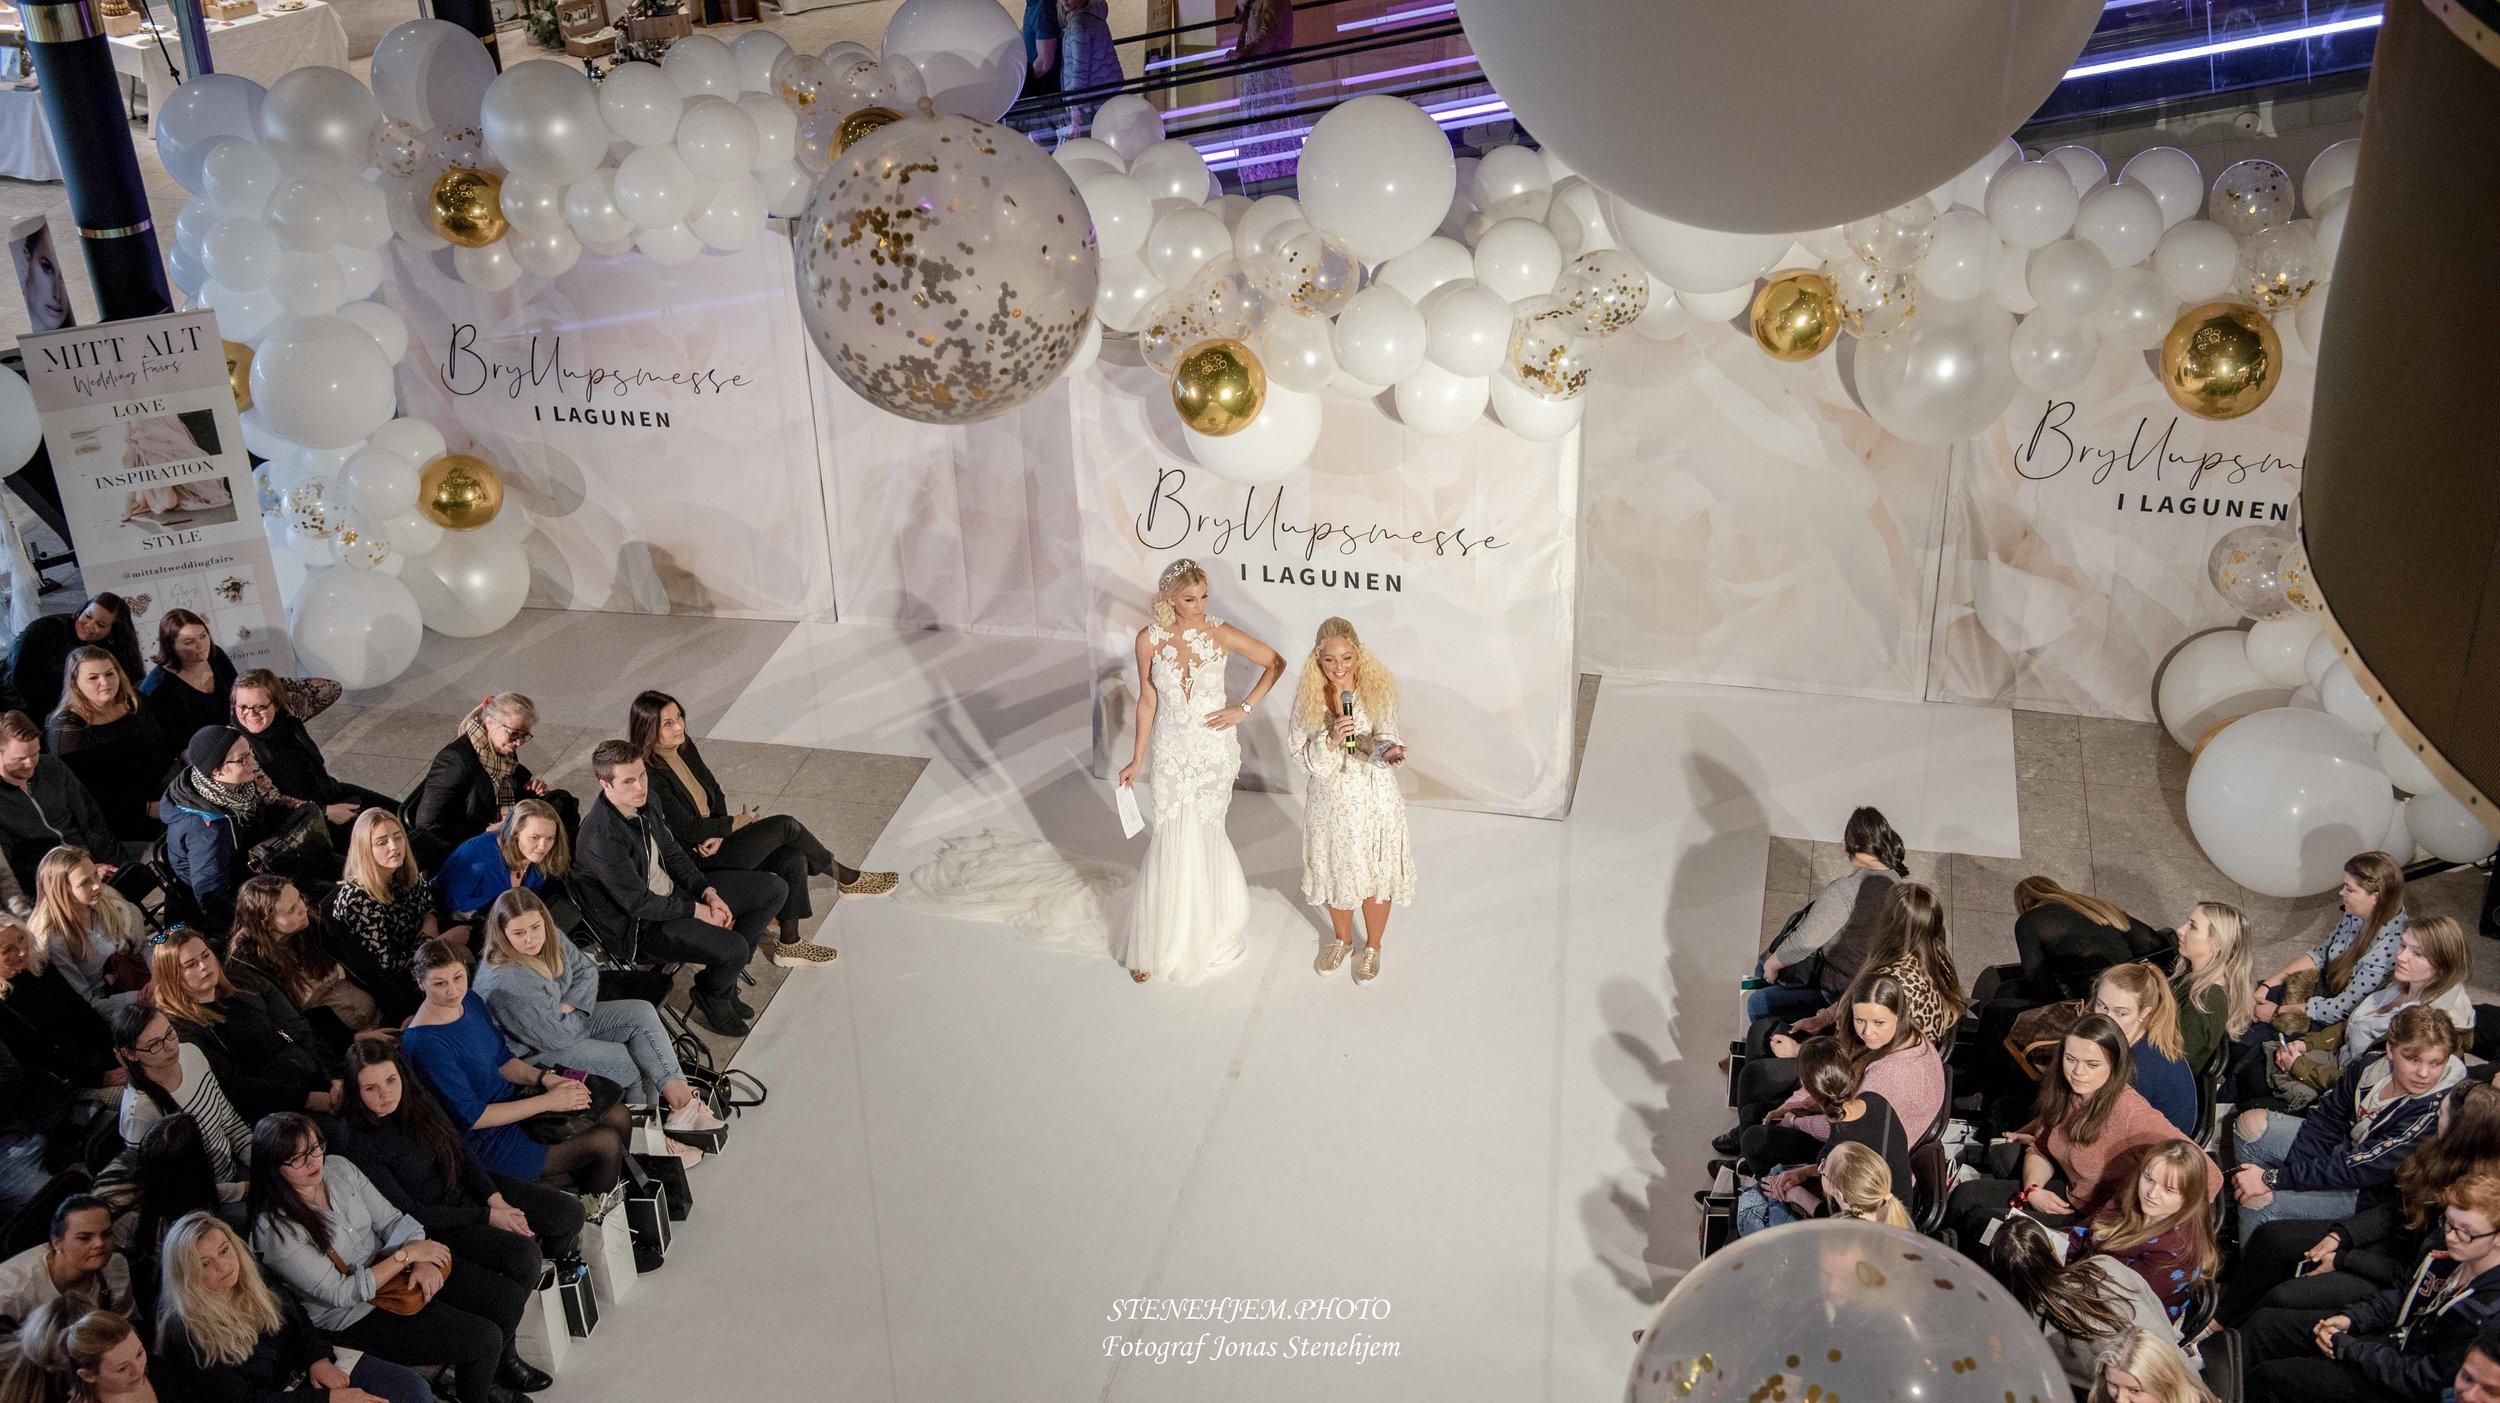 Bryllupsmesse_Lagunen_mittaltweddingfair__095.jpg